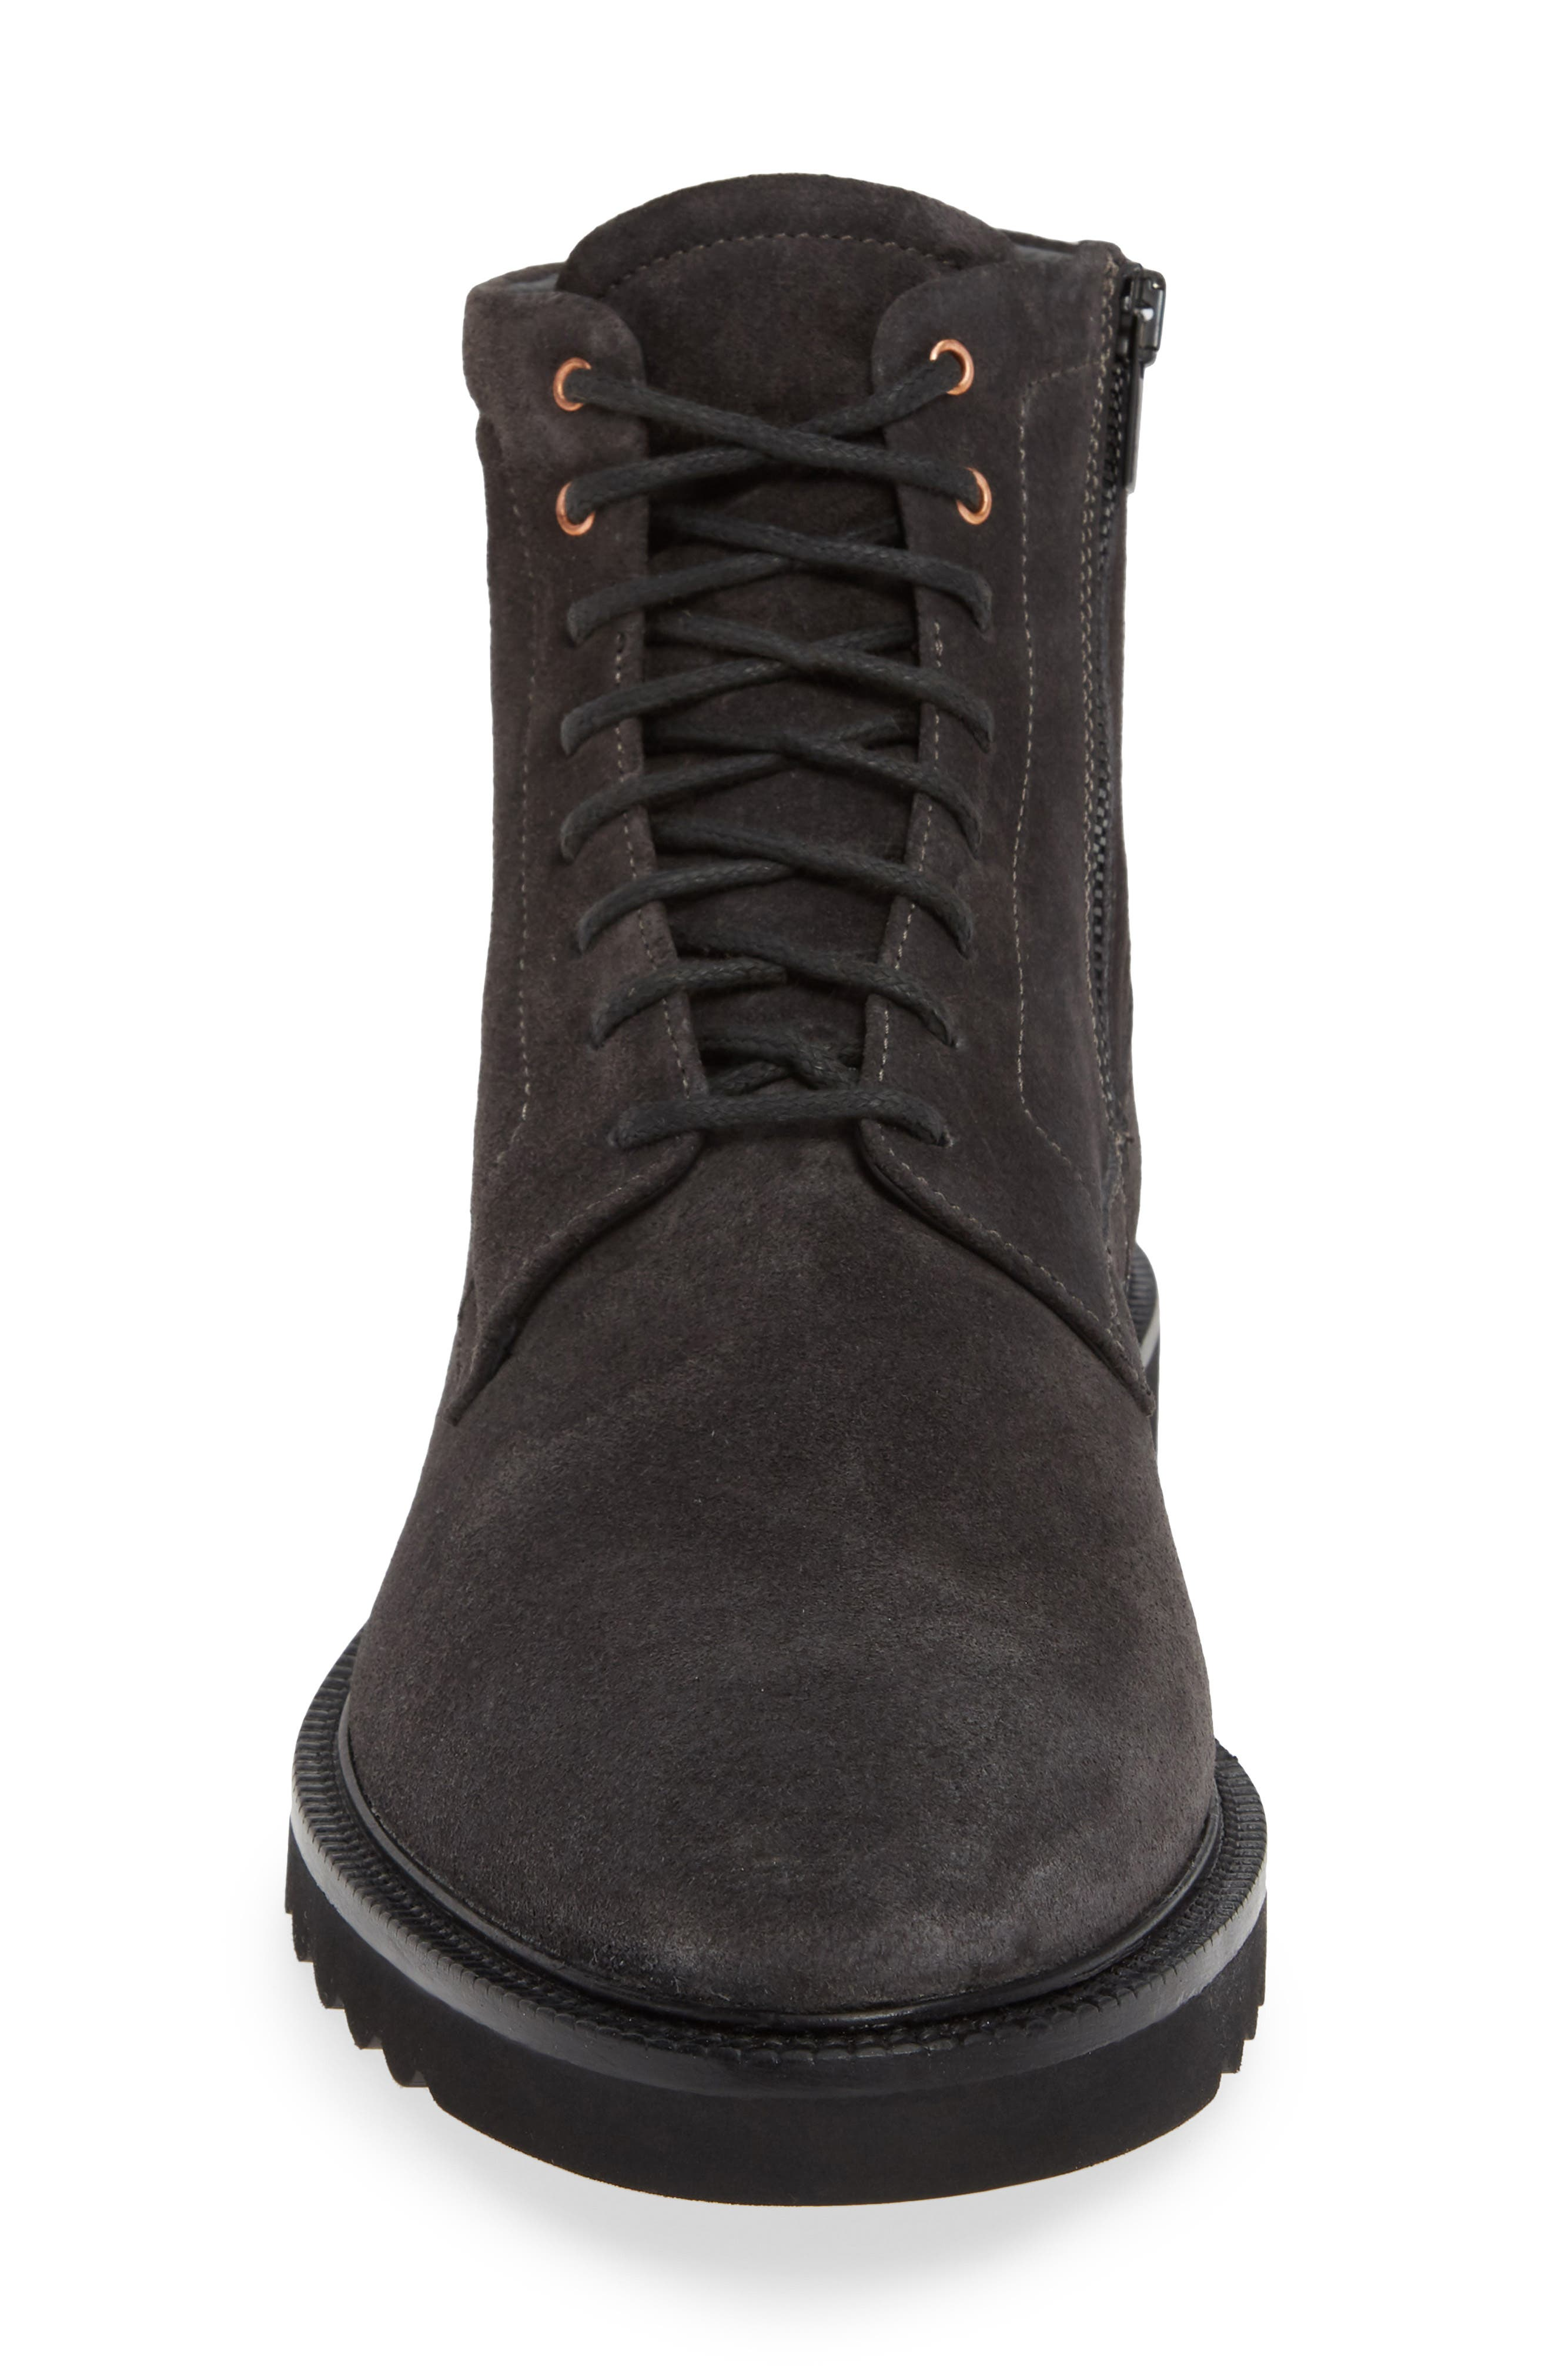 Microlight Plain Toe Boot,                             Alternate thumbnail 4, color,                             CHARCOAL LEATHER